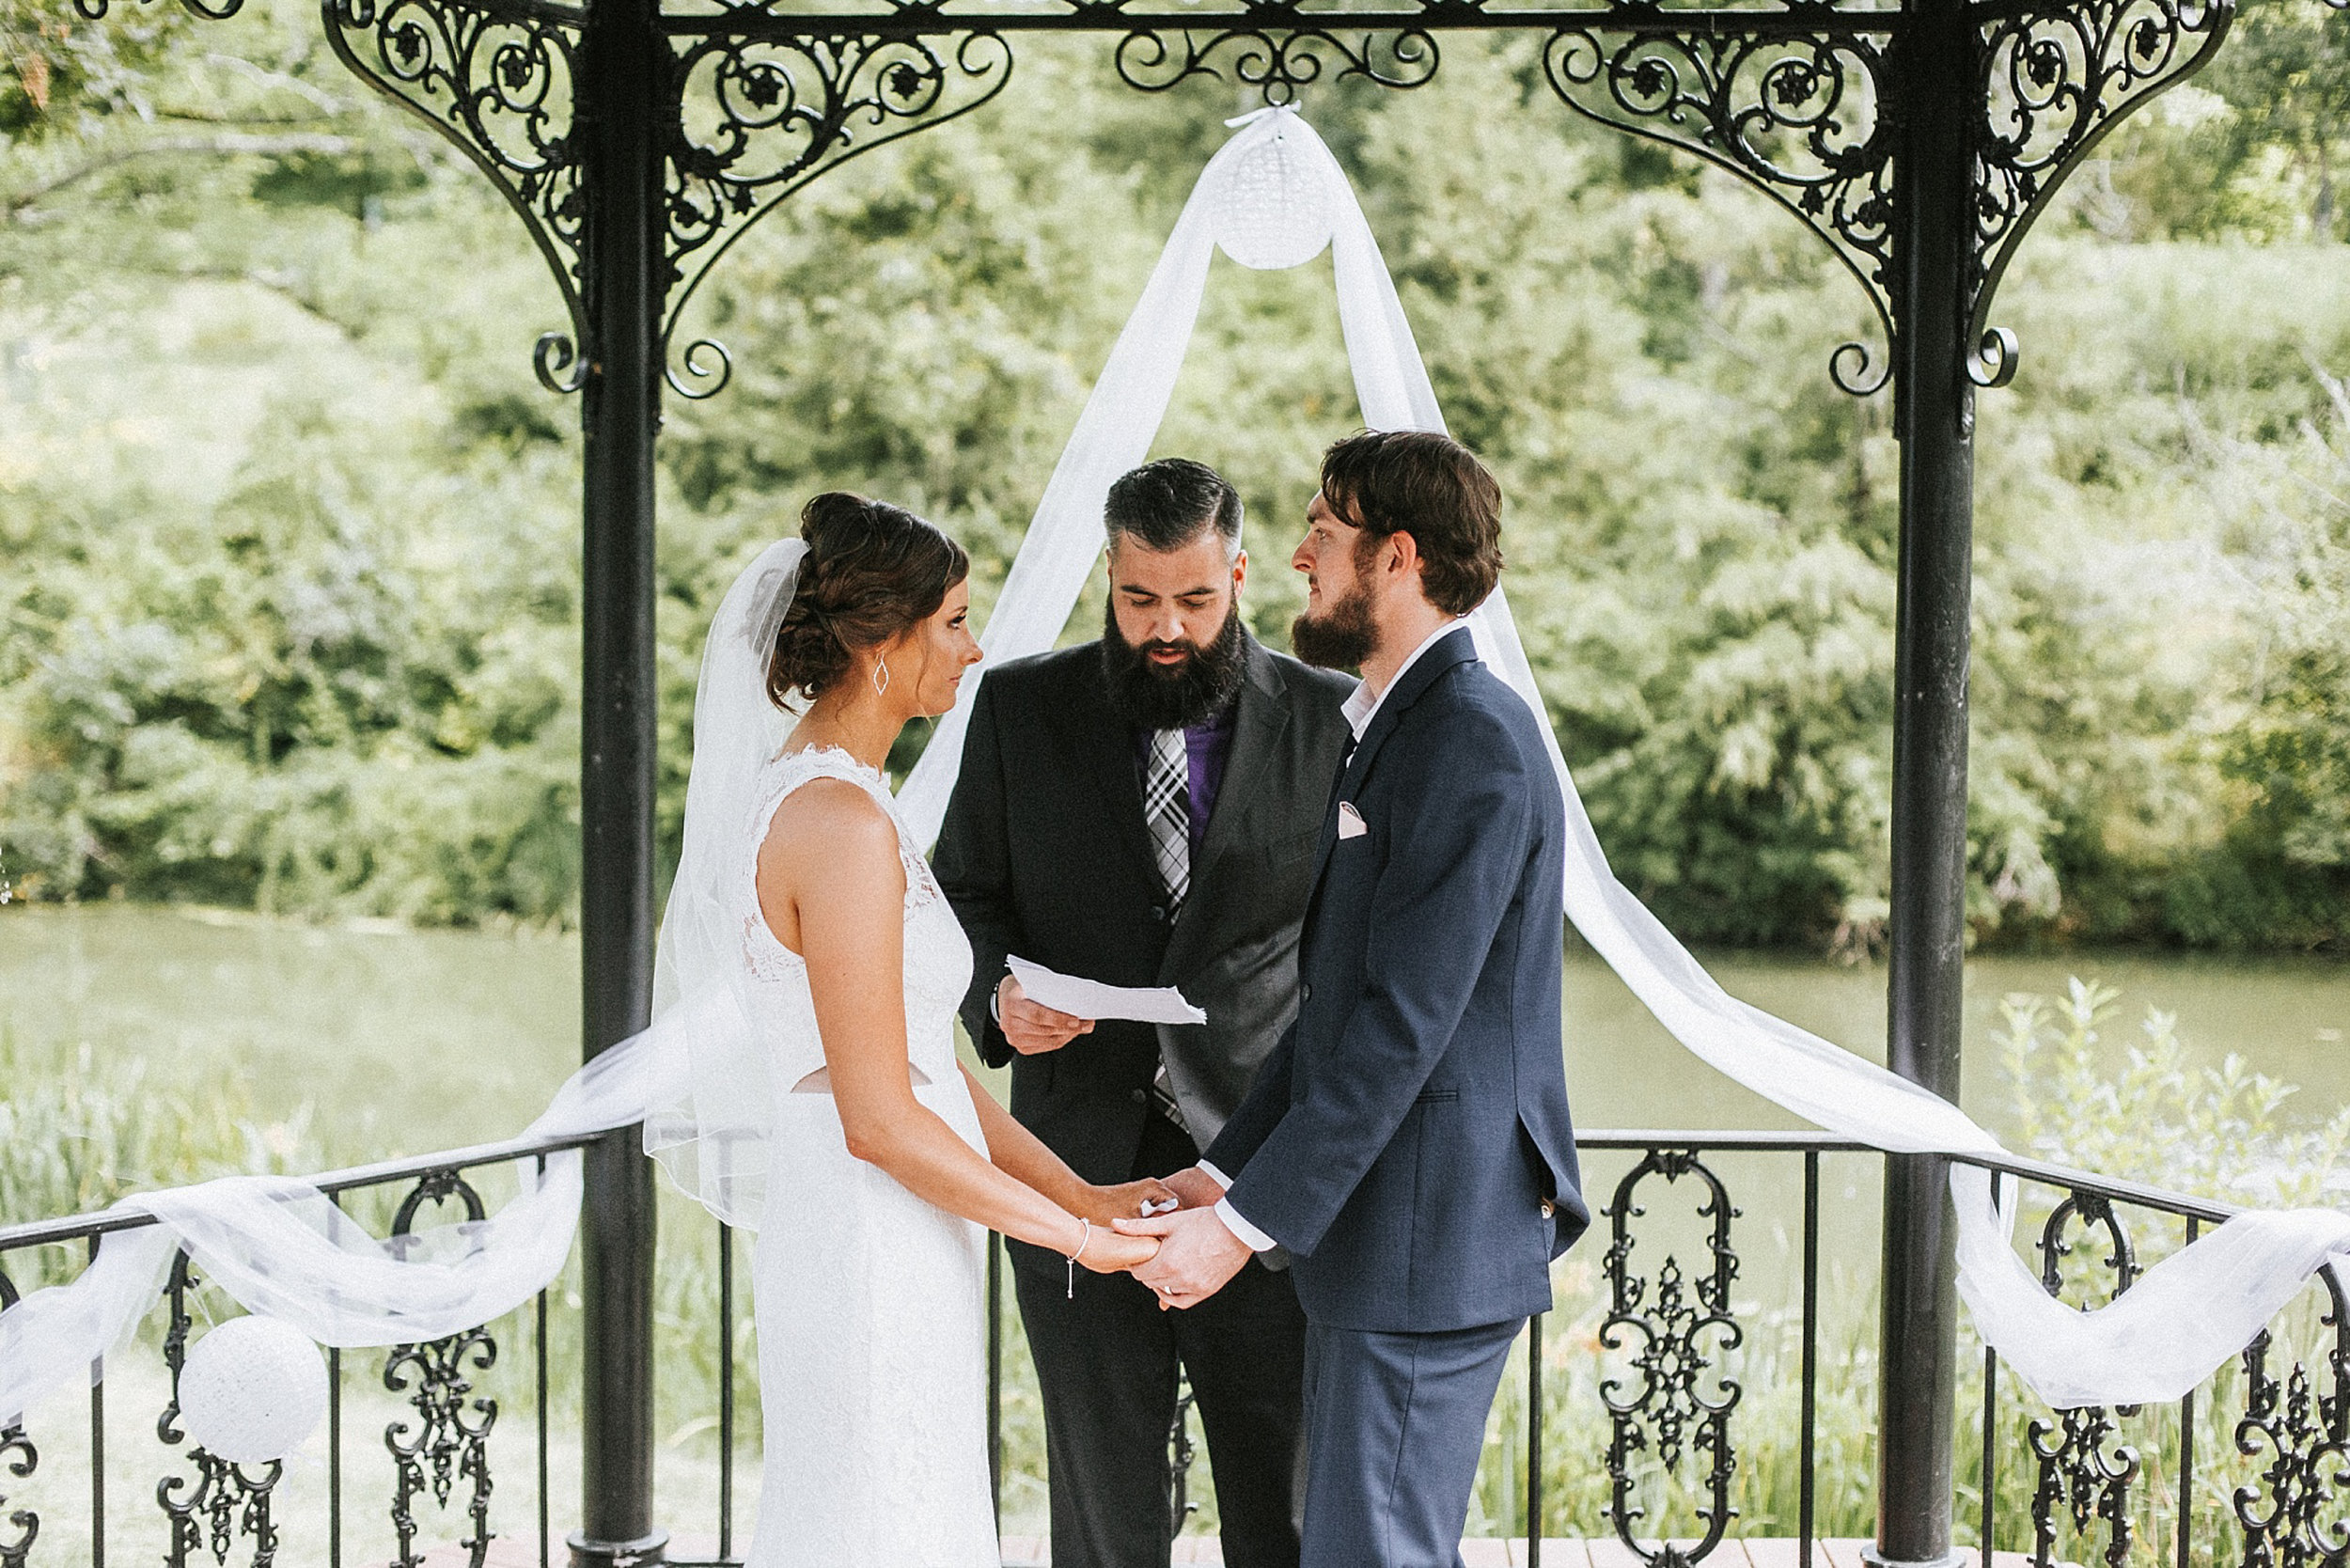 Brooke Townsend Photography - Ohio Wedding Photographer (60 of 78).jpg